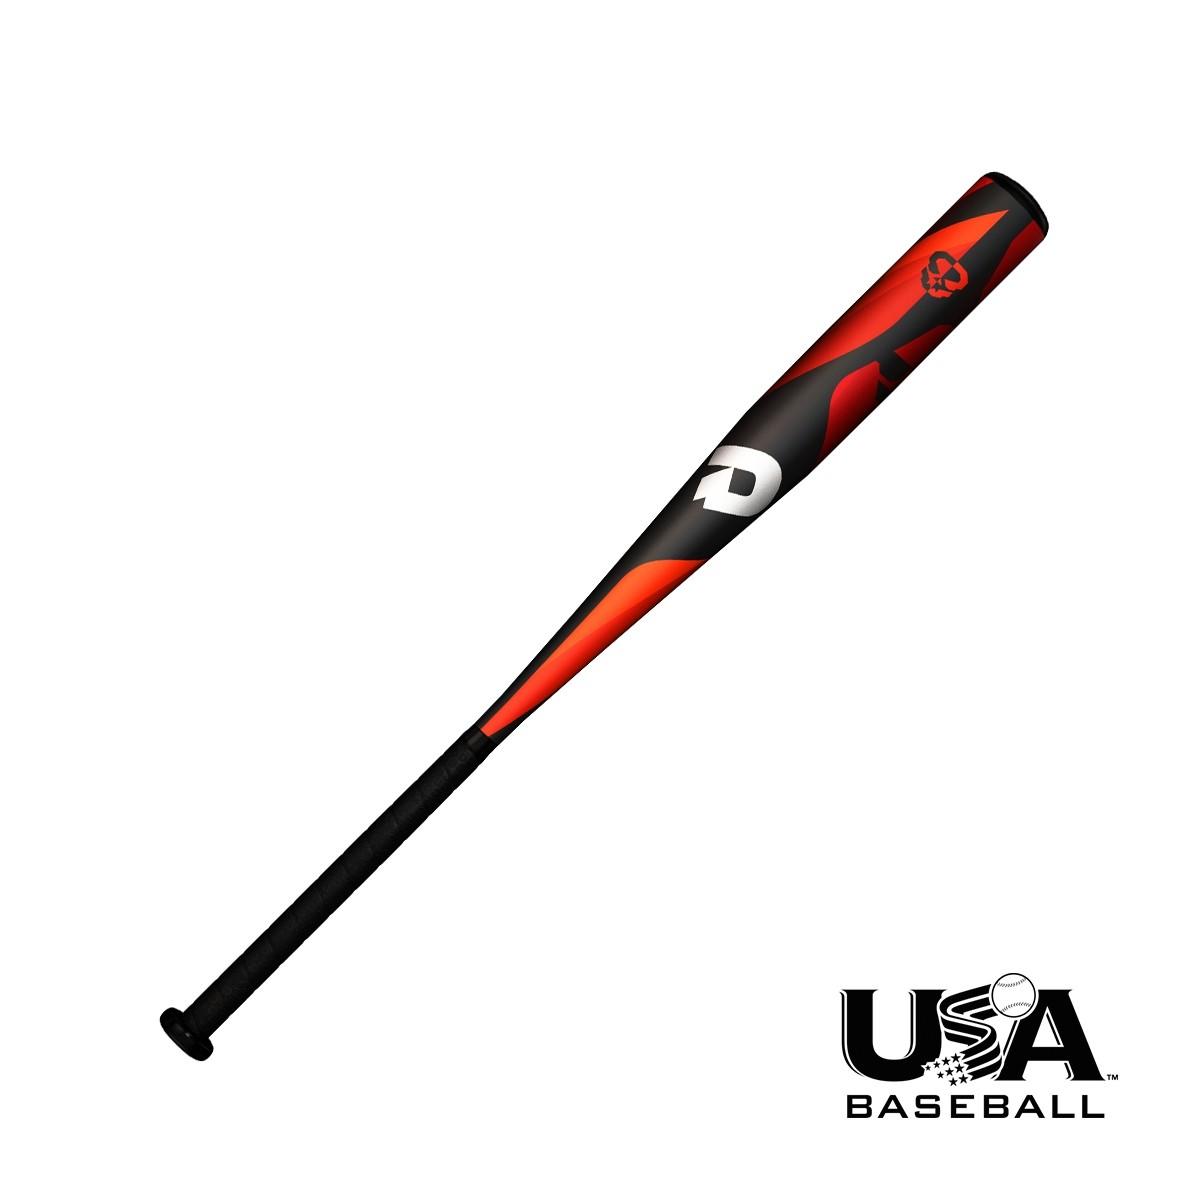 demarini-2018-uprising-usa-baseball-bat-29-inch-19-oz-2-5-barrel WTDXUPL1929-18  887768664251 High-strength DX1 alloy built for performance Ironed end cap for lighter